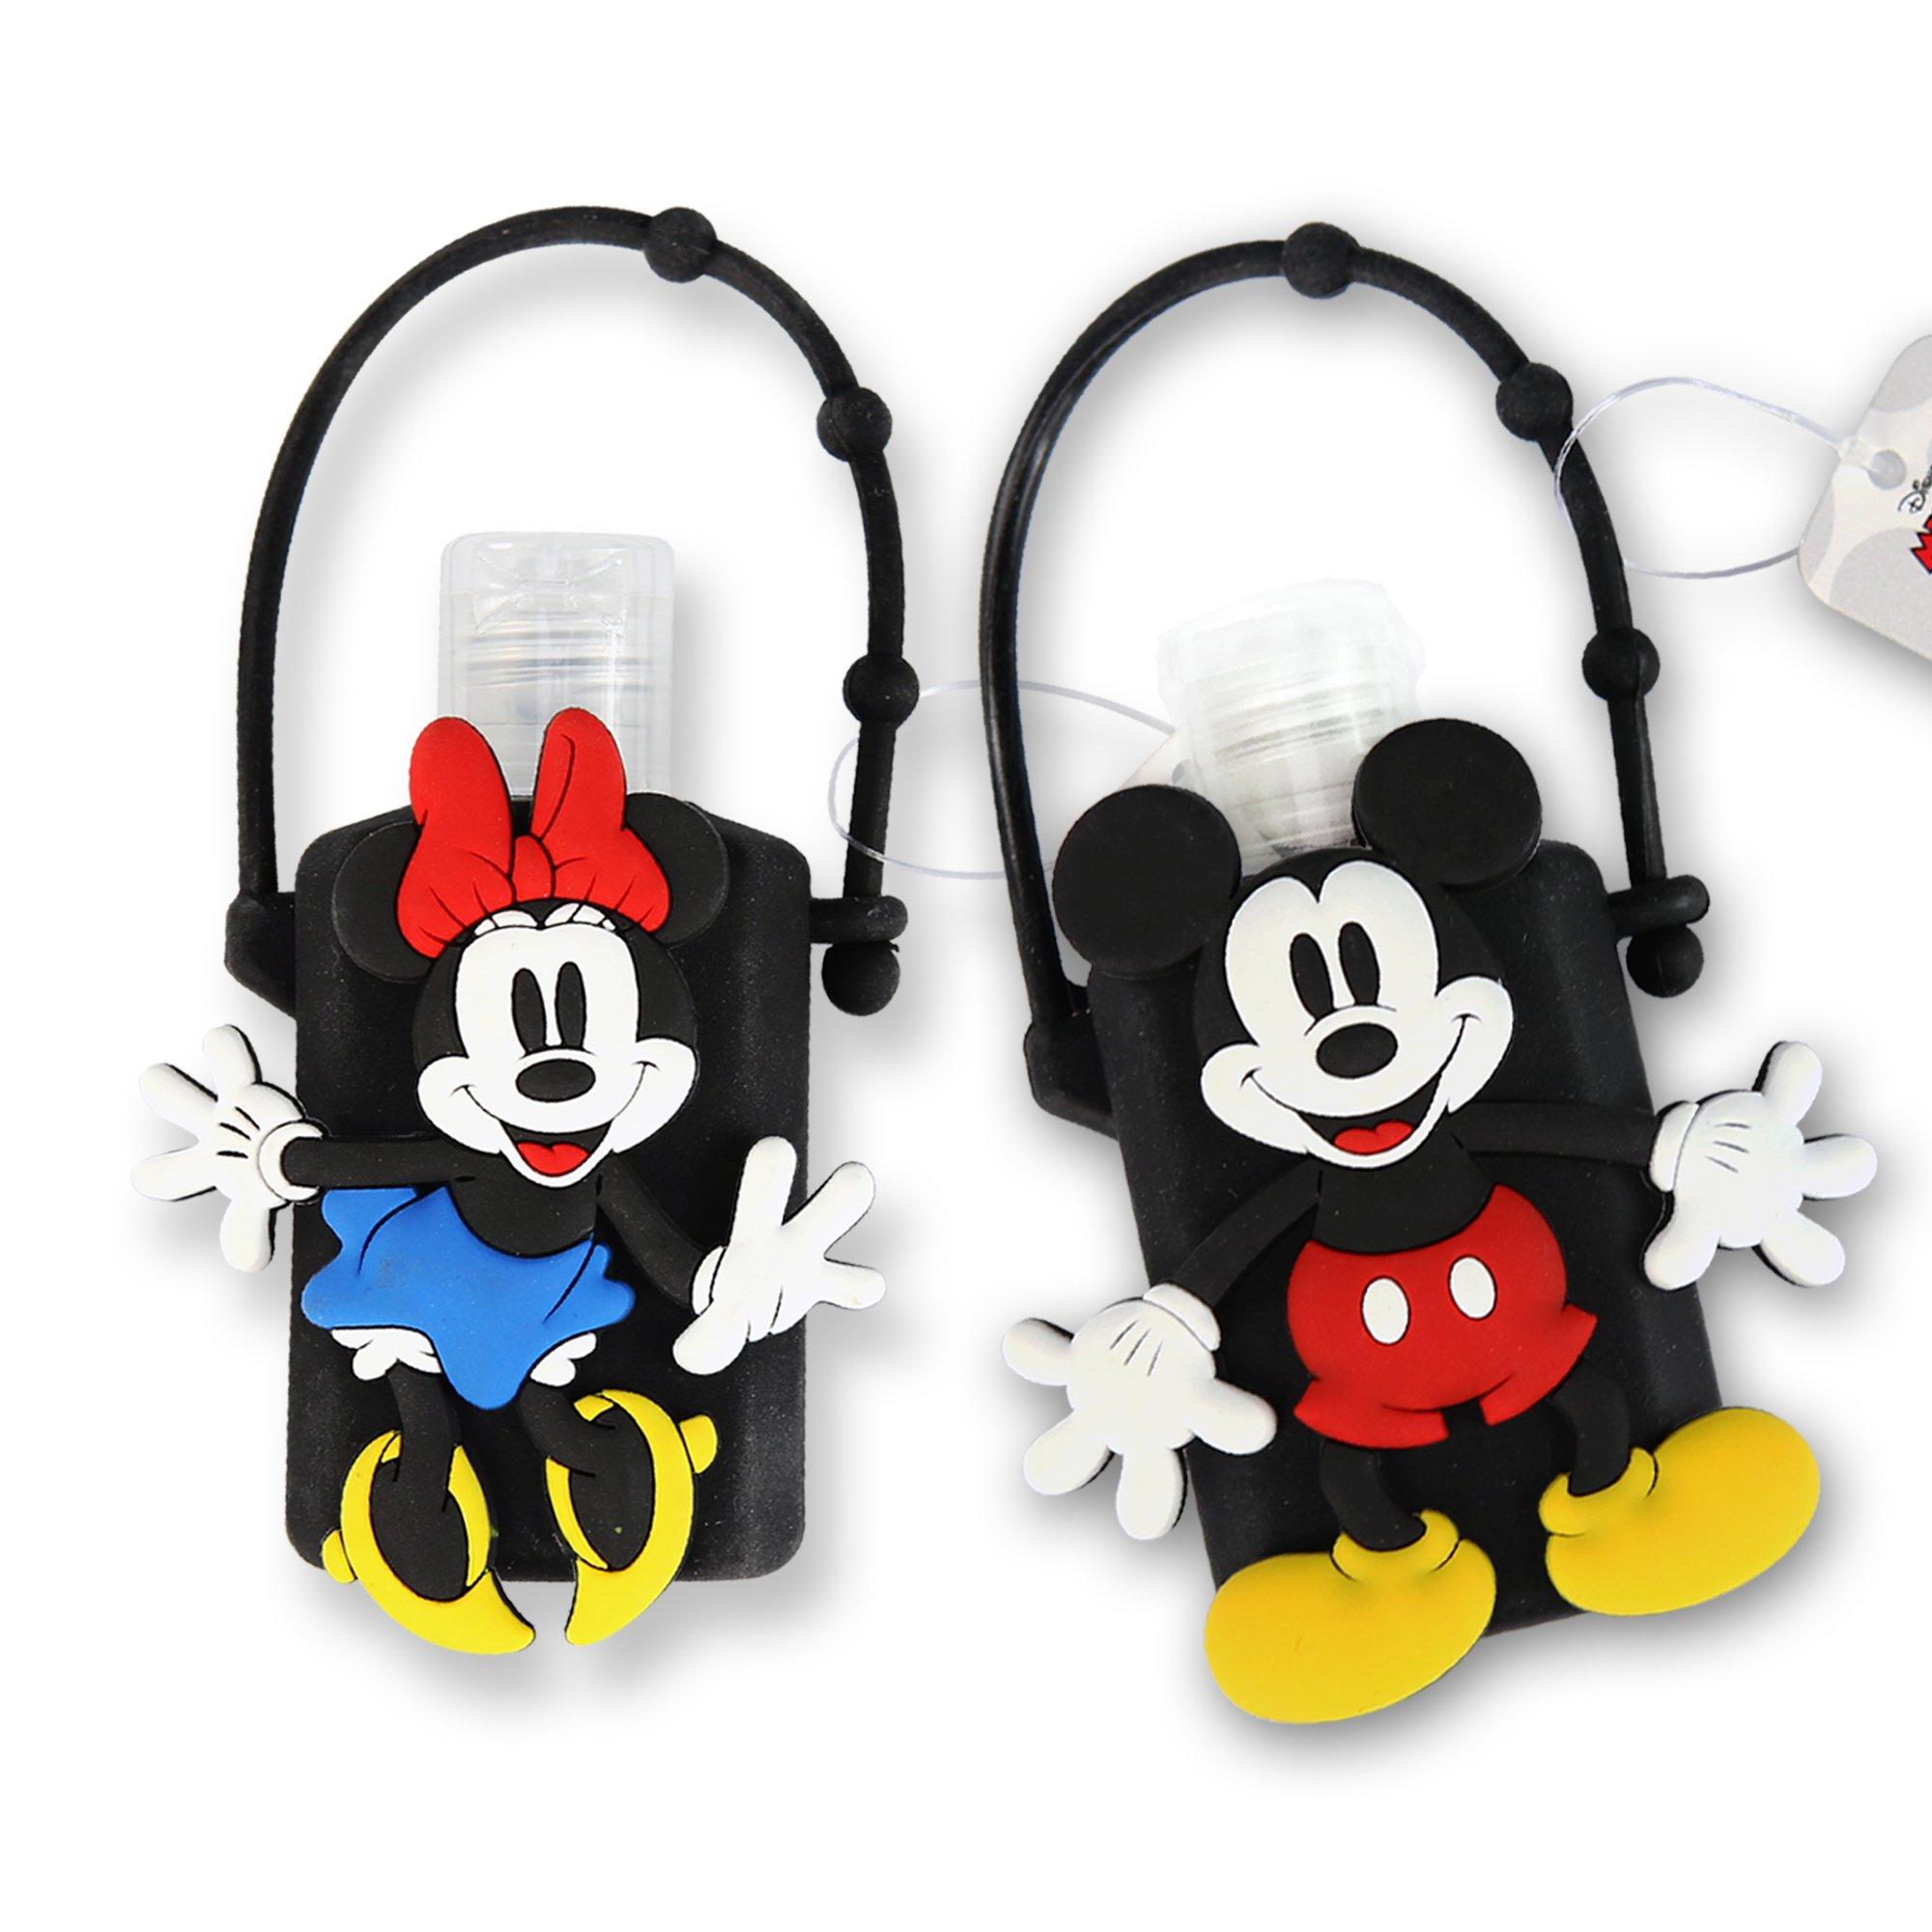 Amazon.com : Adorable Disney Hand Sanitizer with Classic Mickey ...